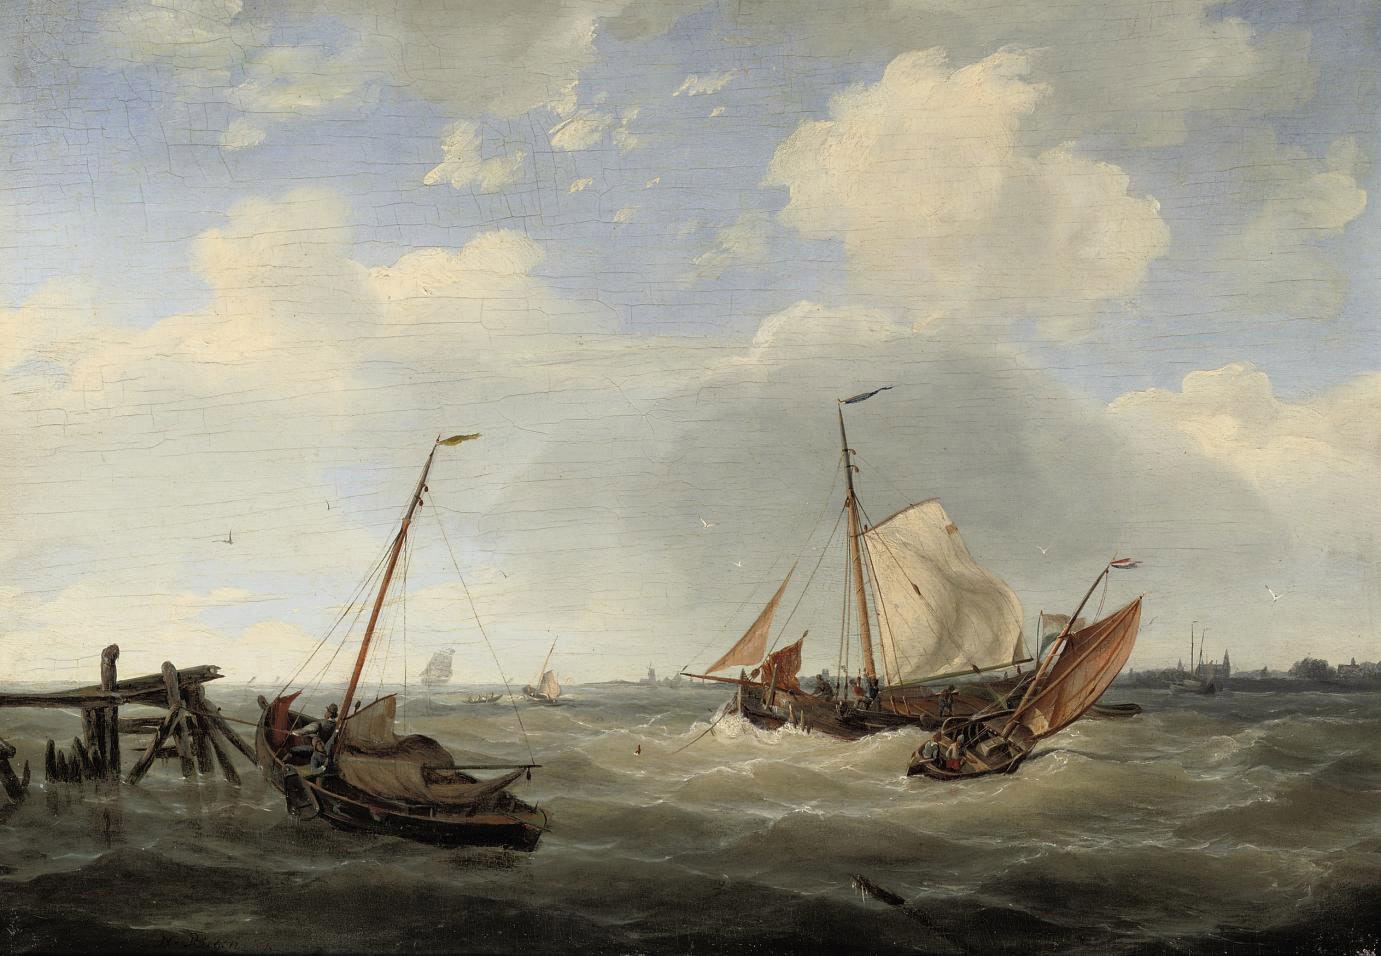 Sailing on choppy waters